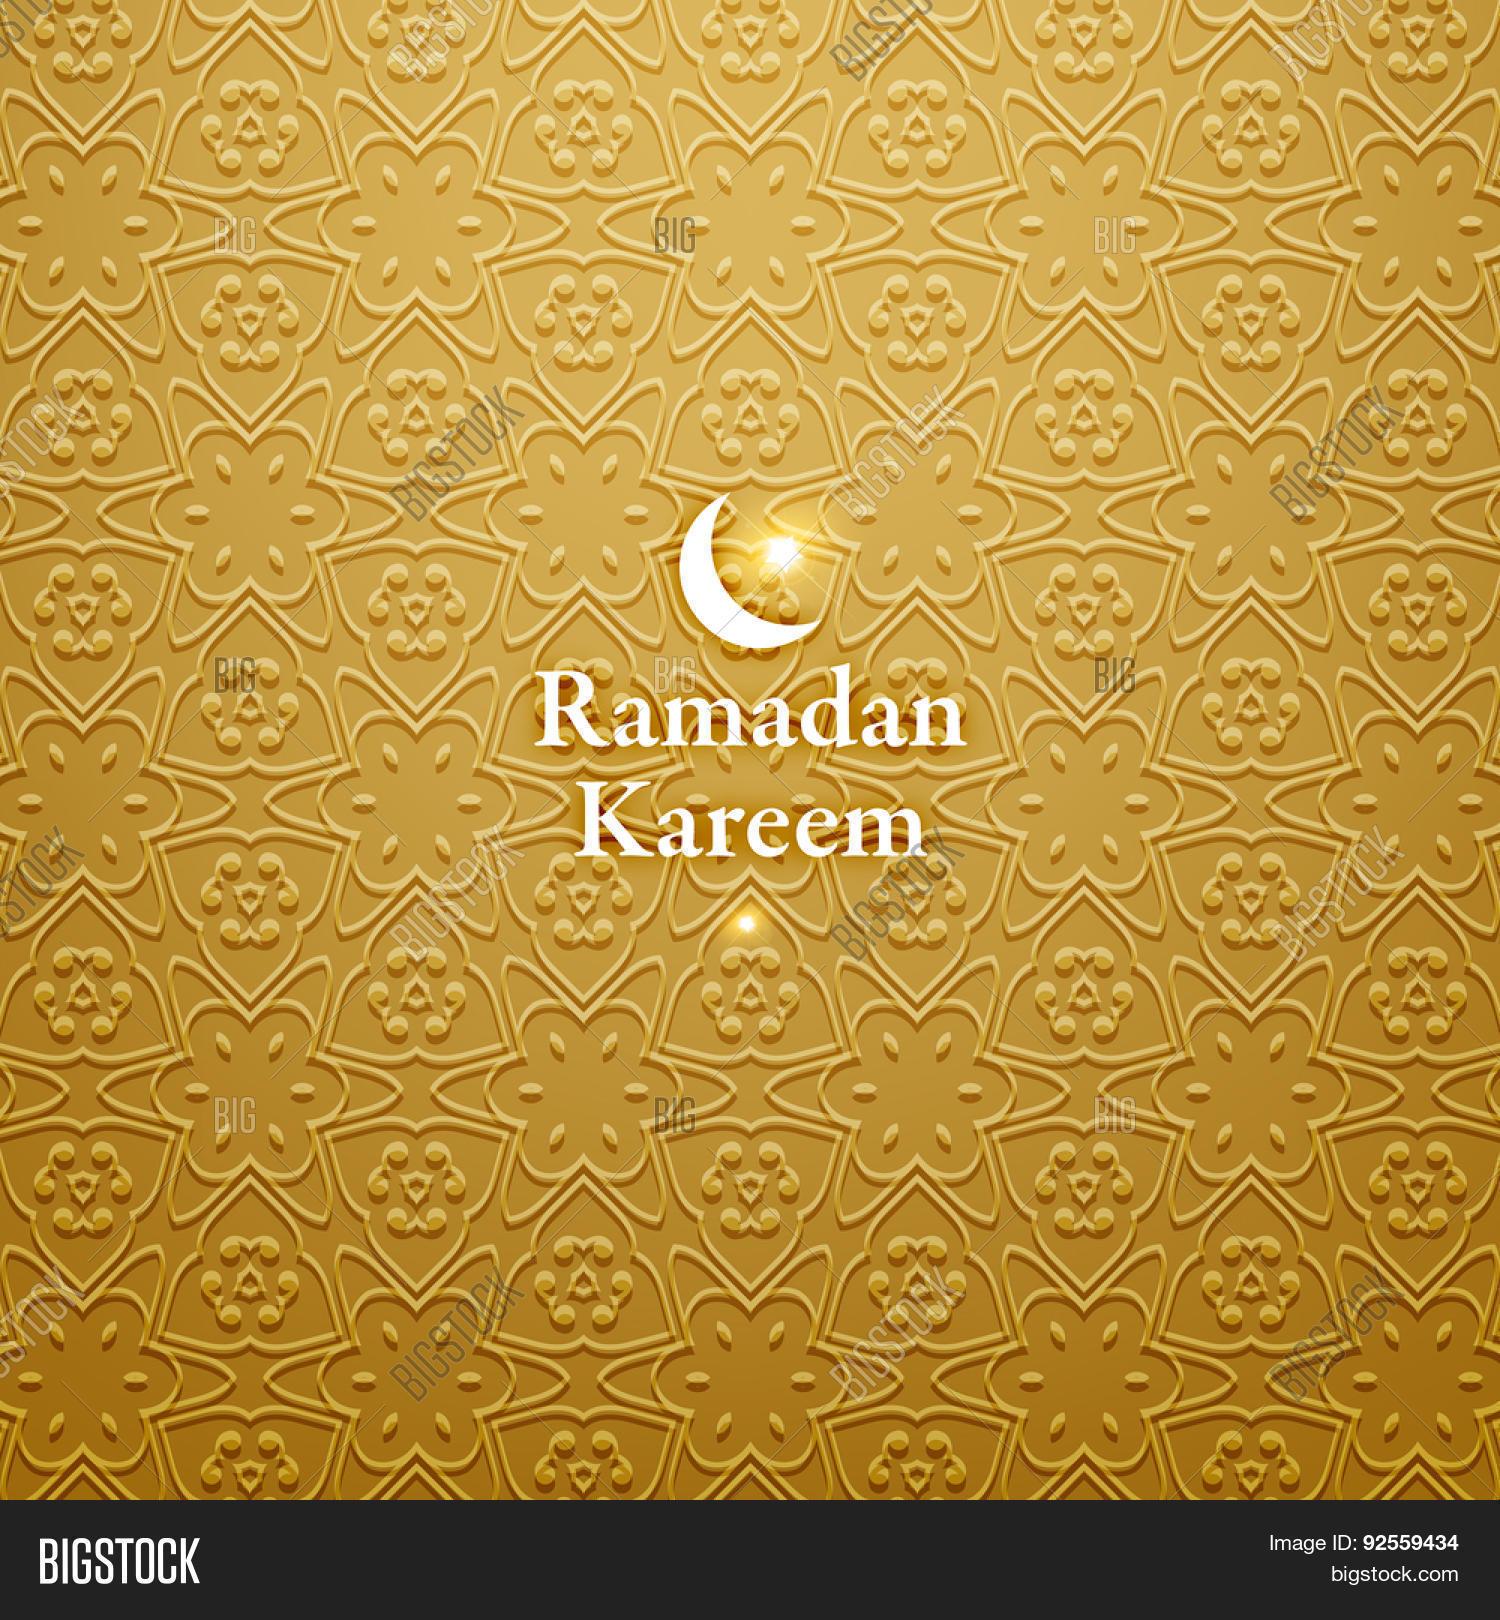 Ramadan kareem ramadan greeting vector photo bigstock ramadan greeting card background muslim seamless pattern holiday design kristyandbryce Images